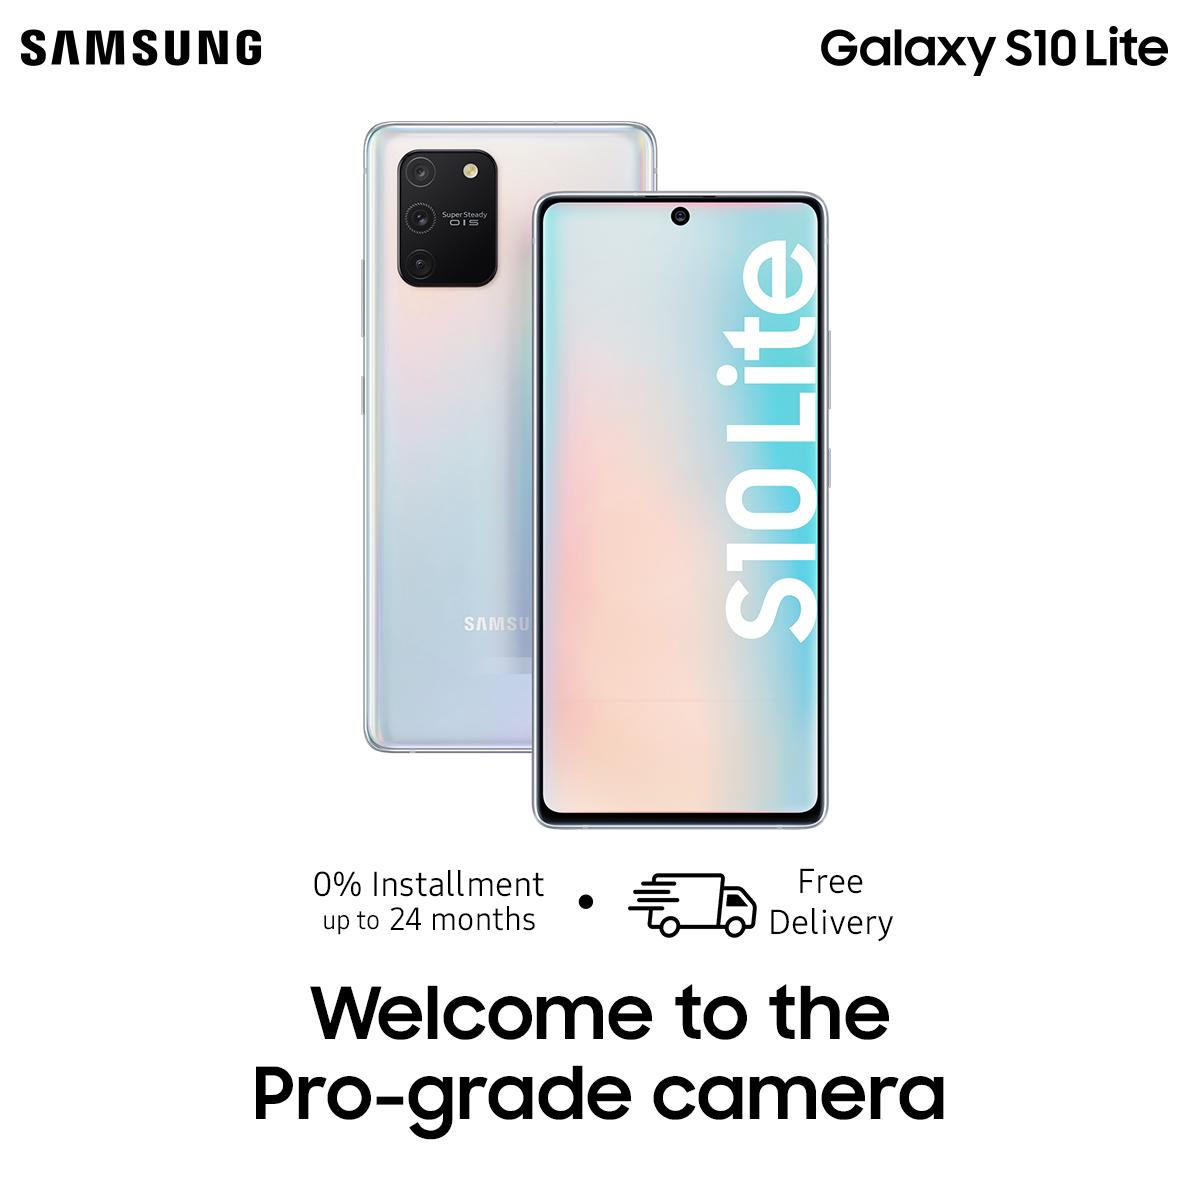 image promo